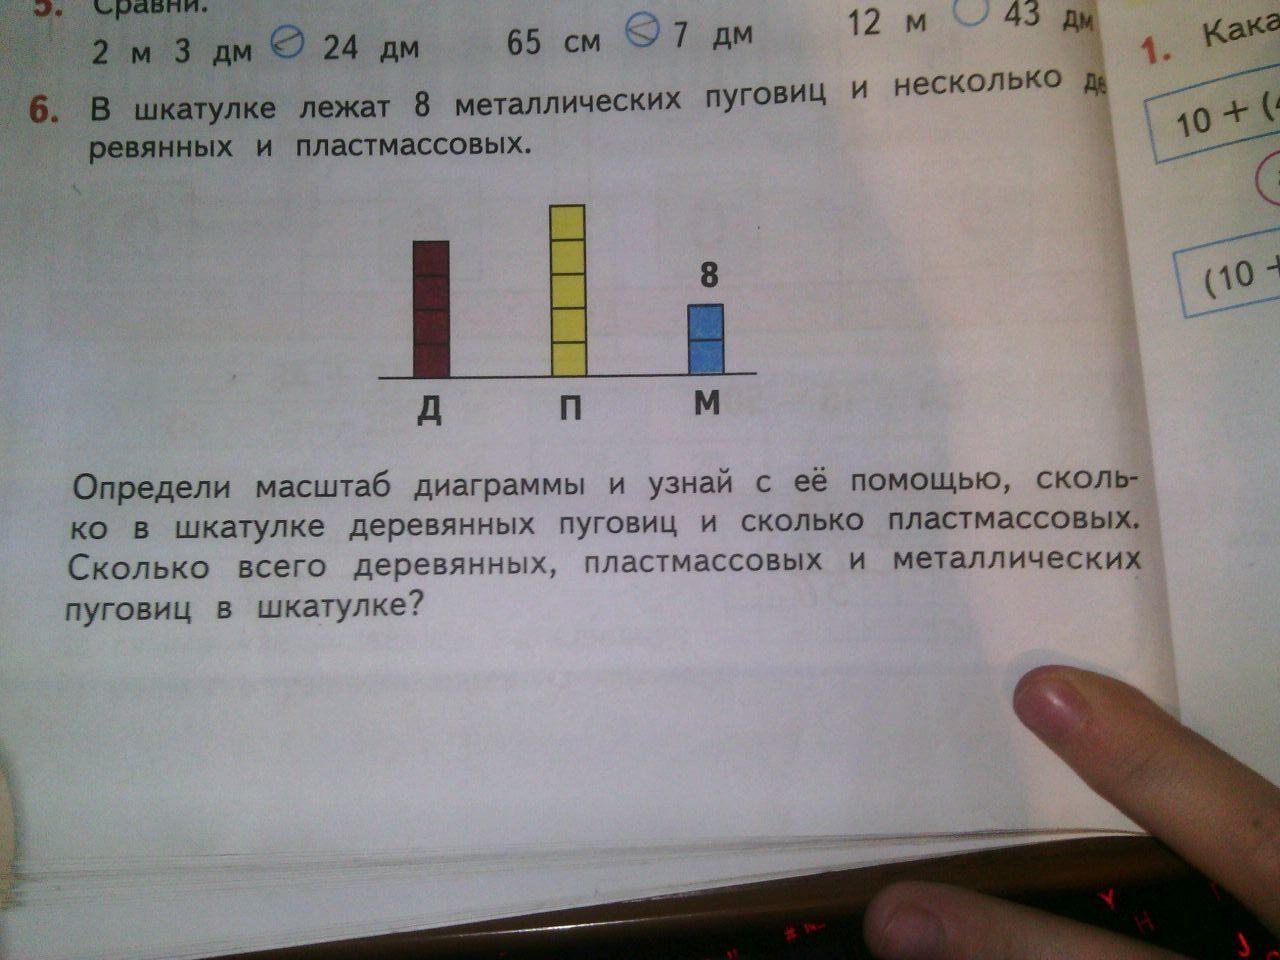 Помогите решить задачу номер 6